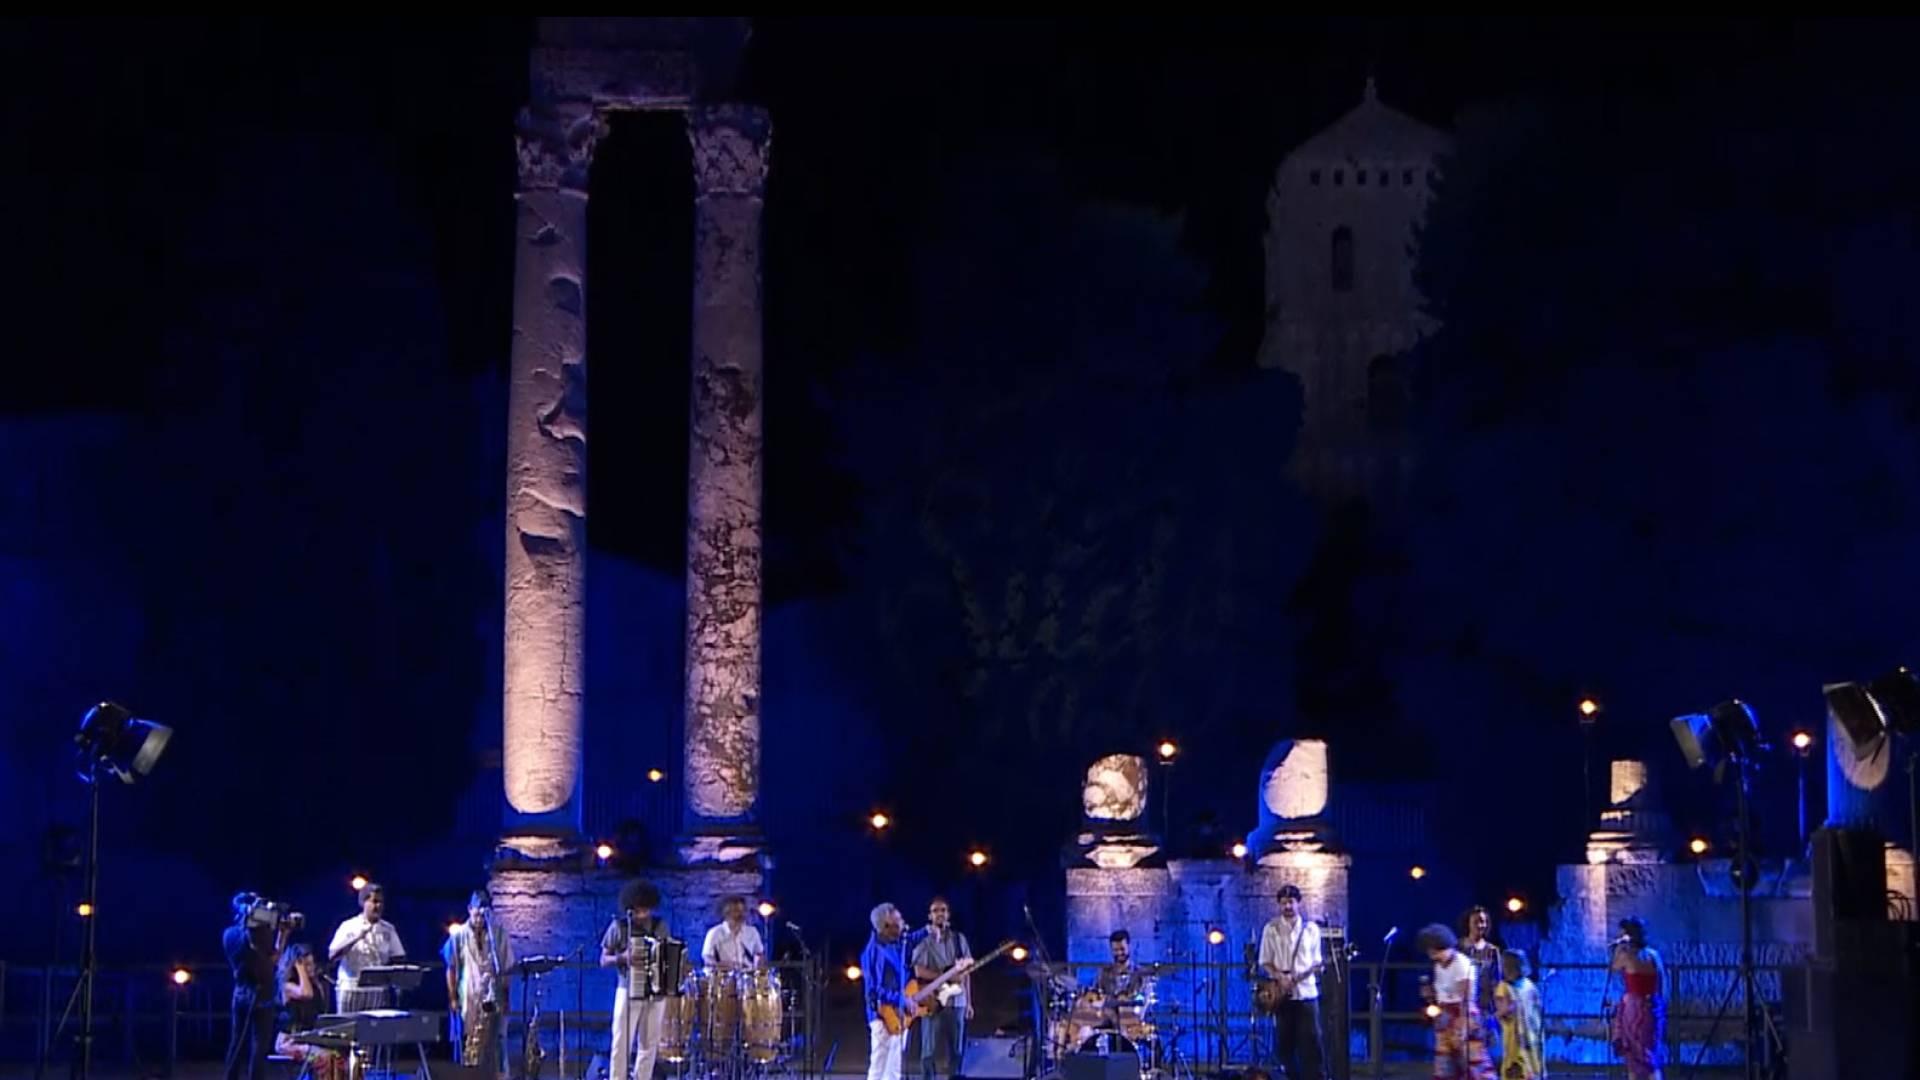 Video Merci Festival Les Suds,à Arles 2018